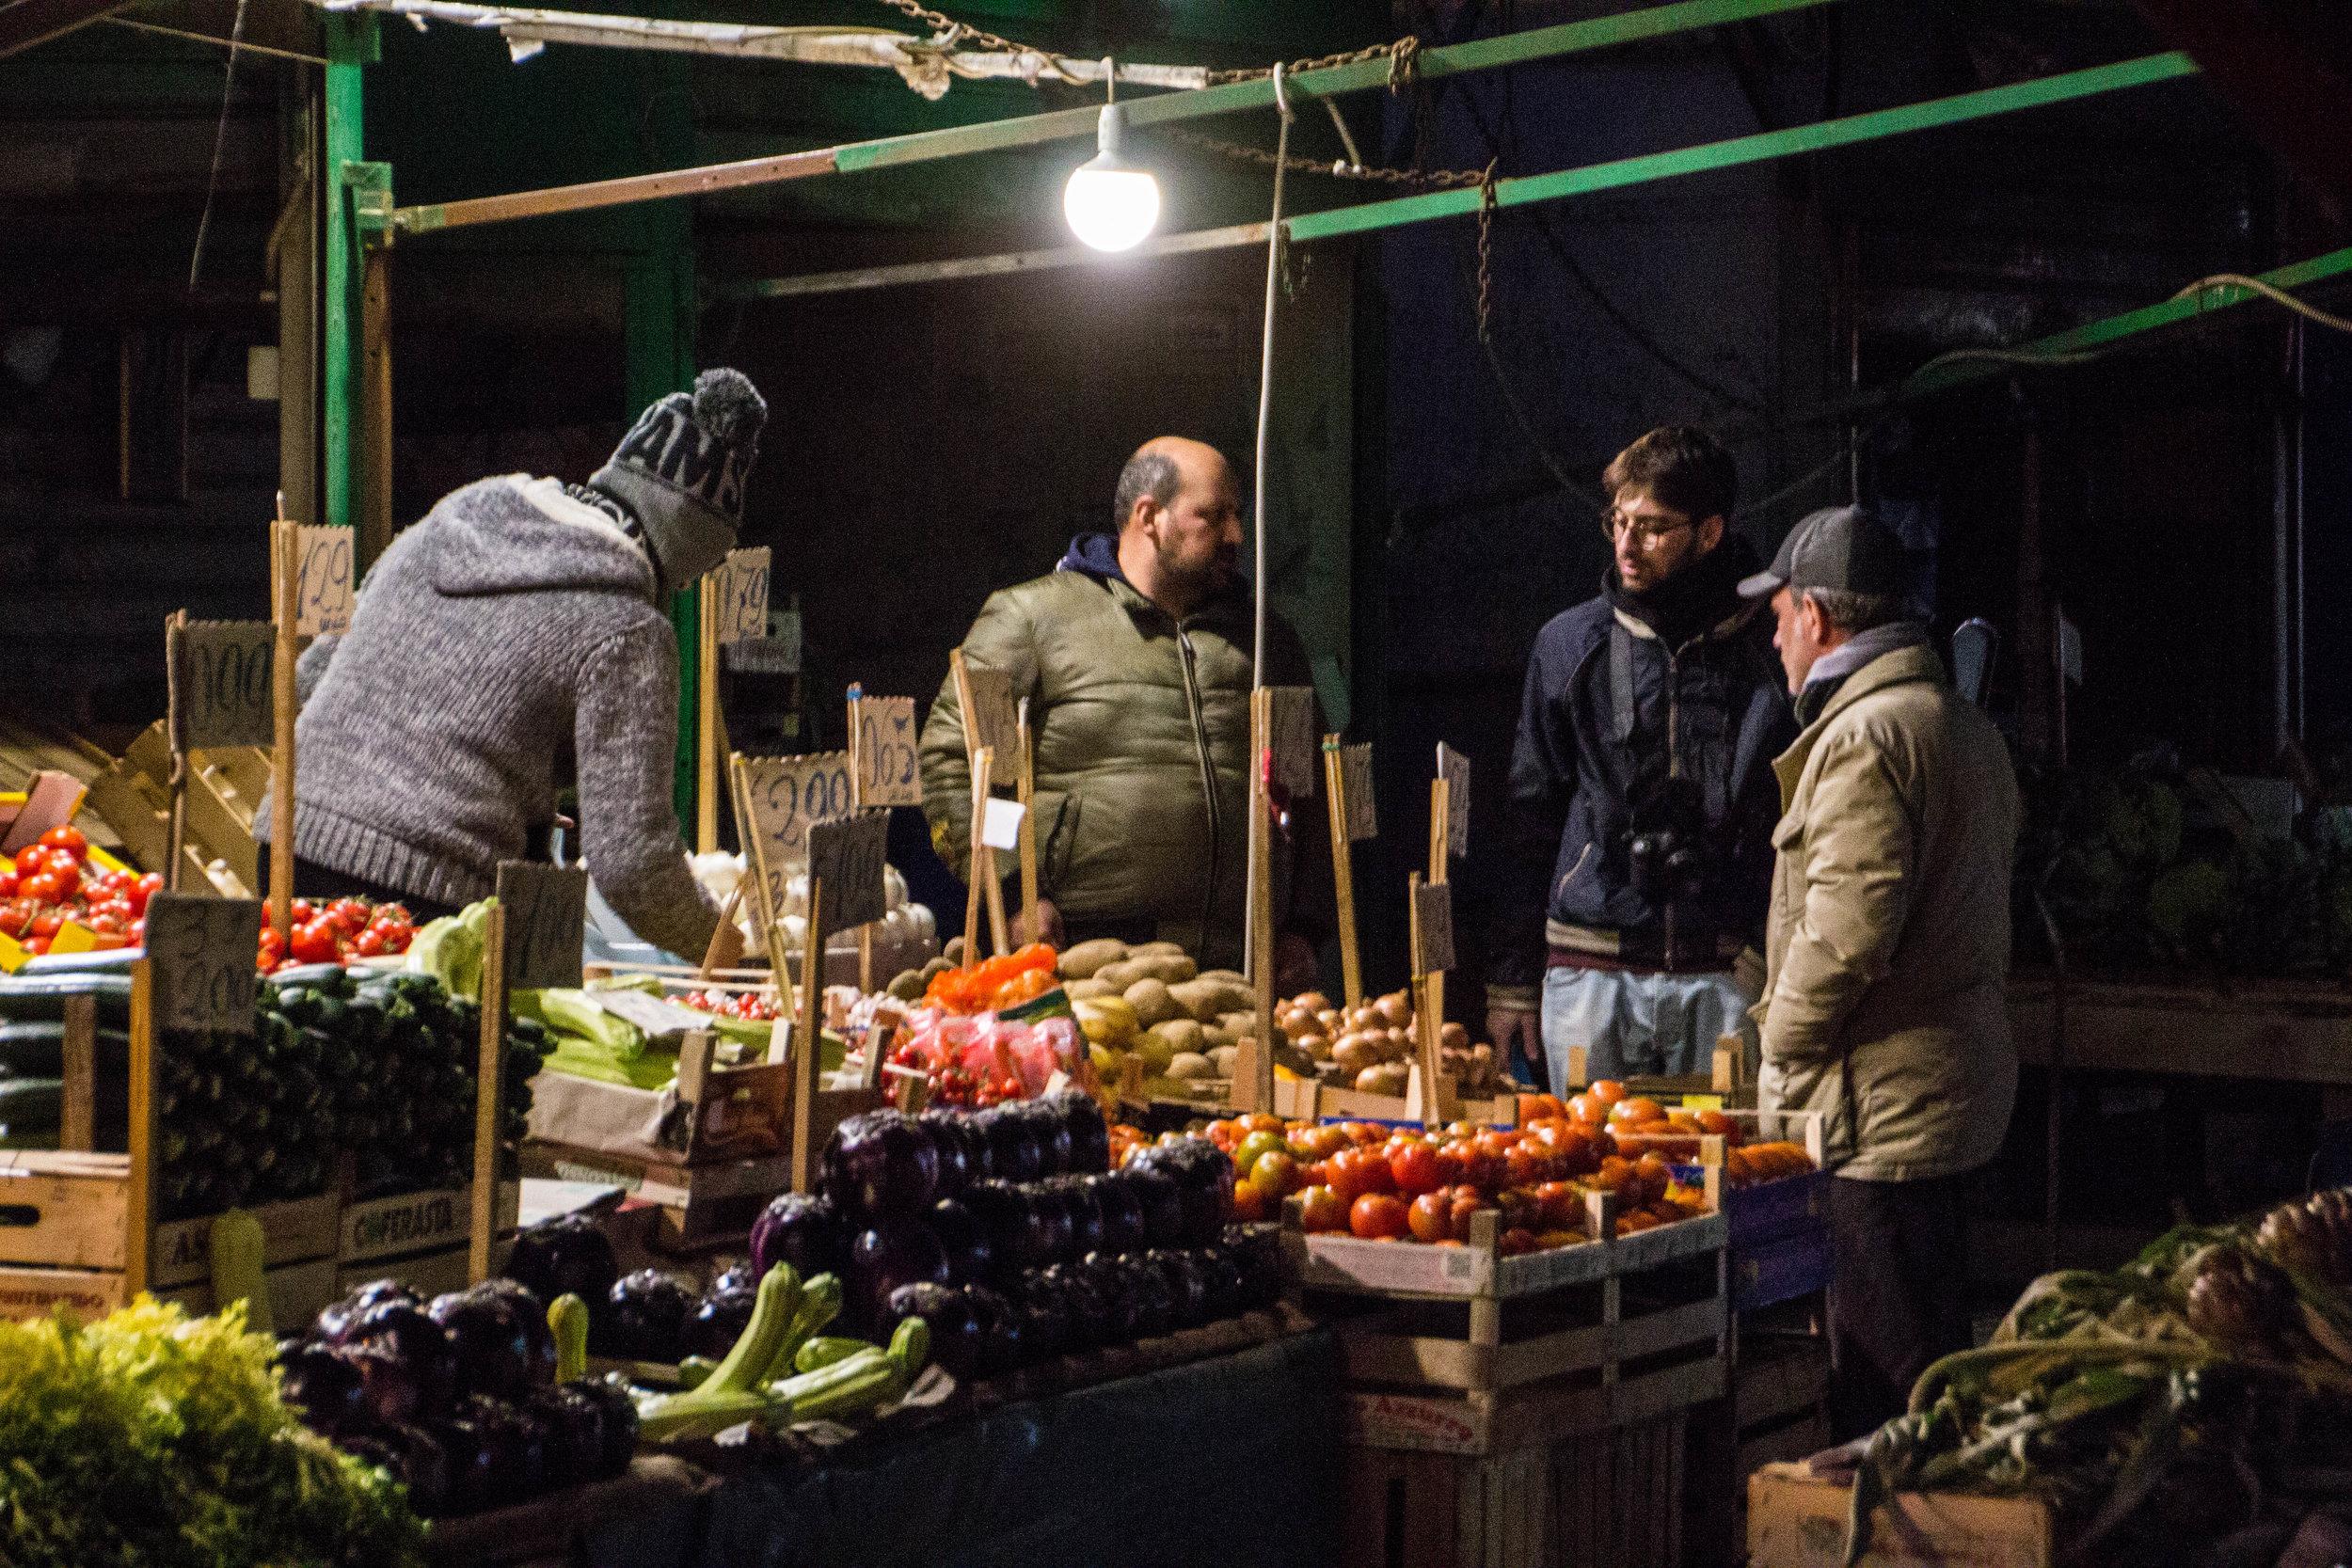 night-street-market-palermo-sicily-2.jpg